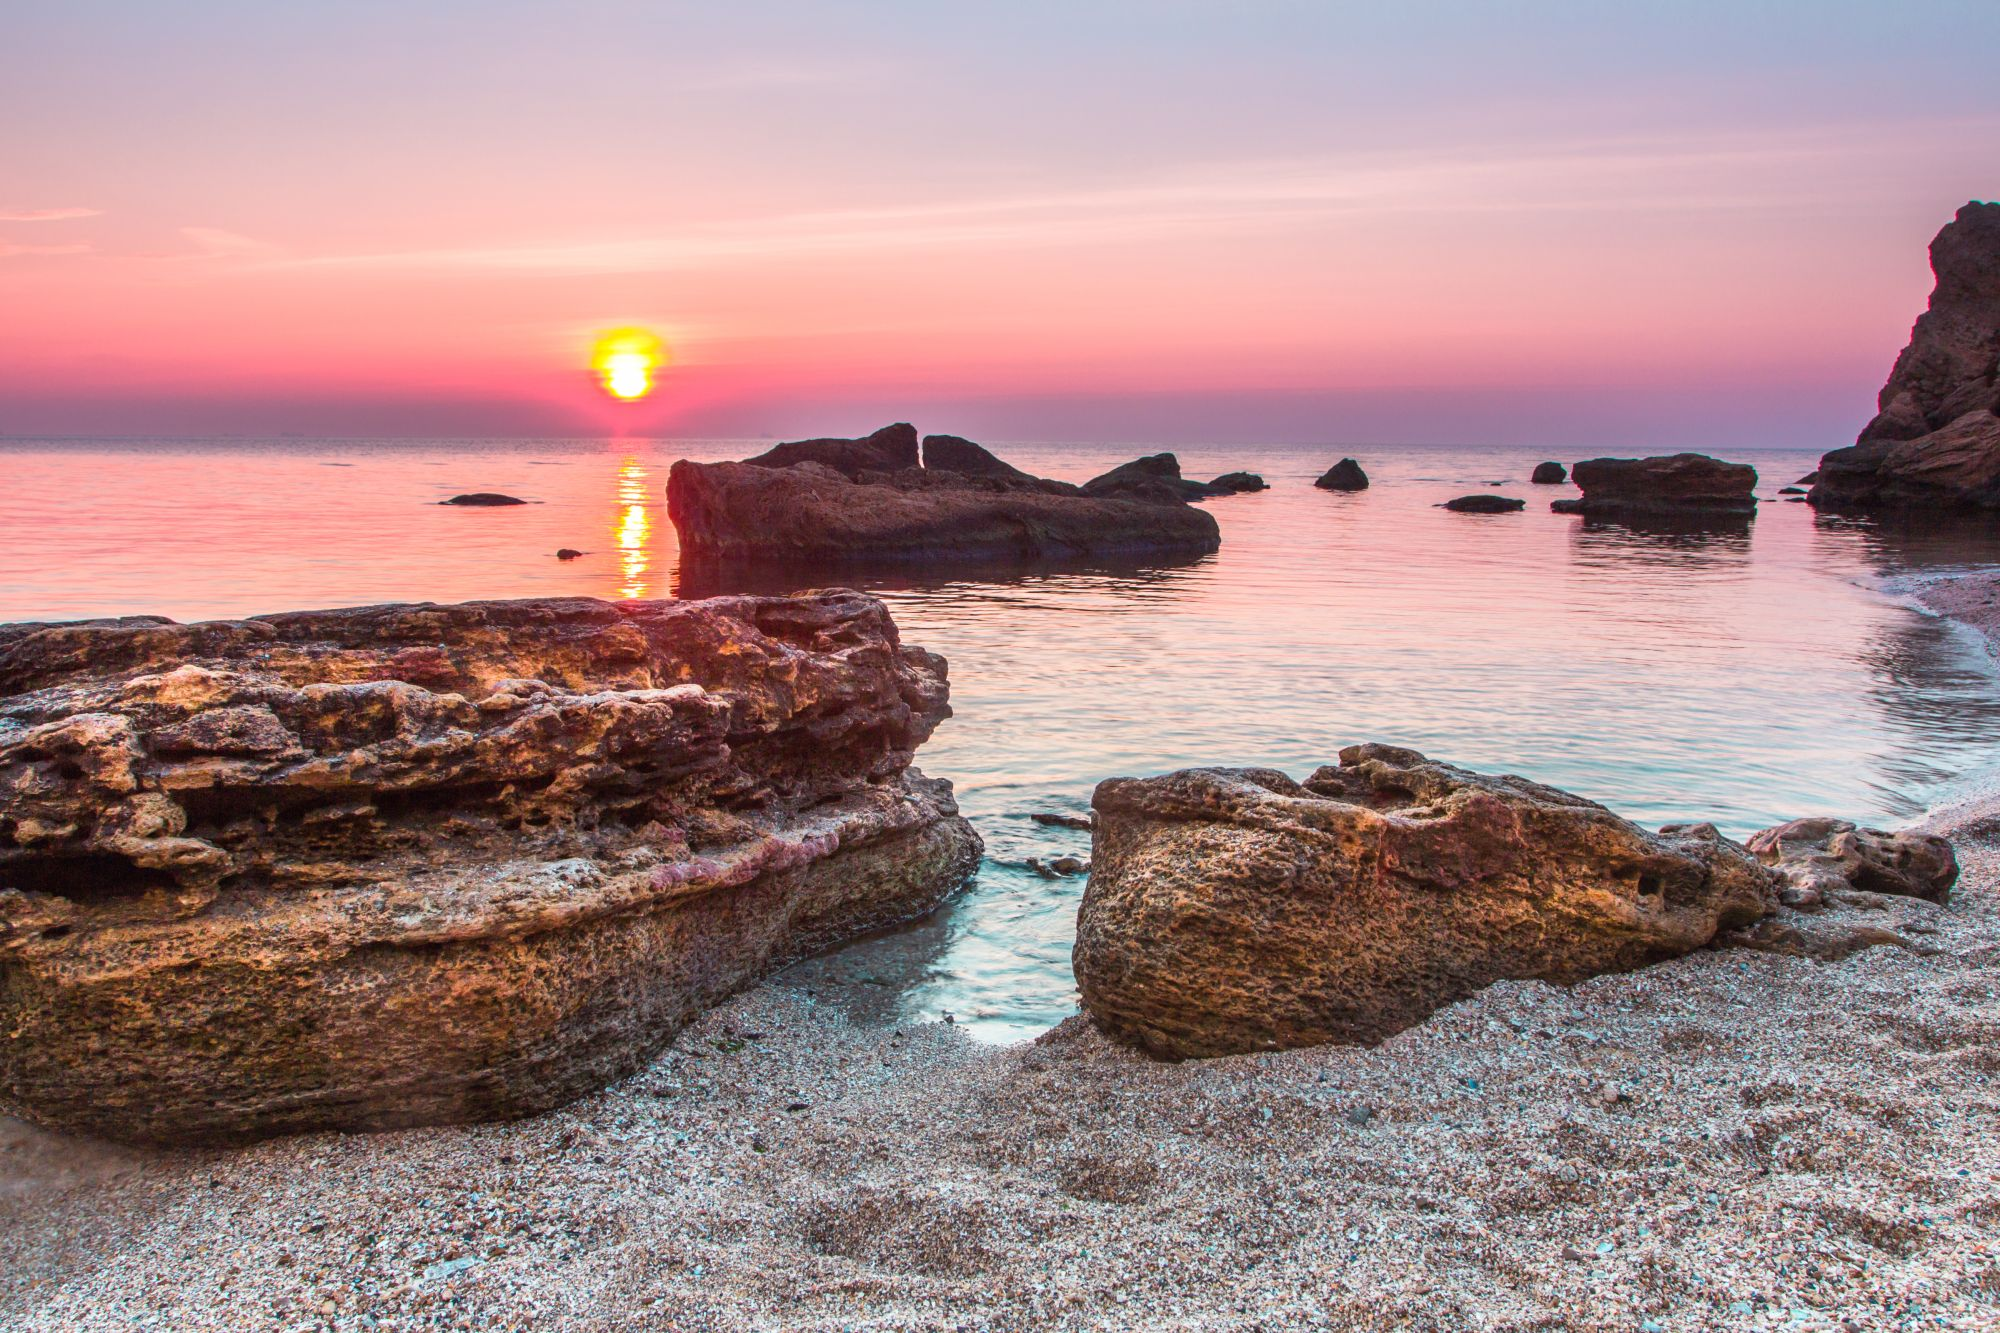 Odessa widok plaży